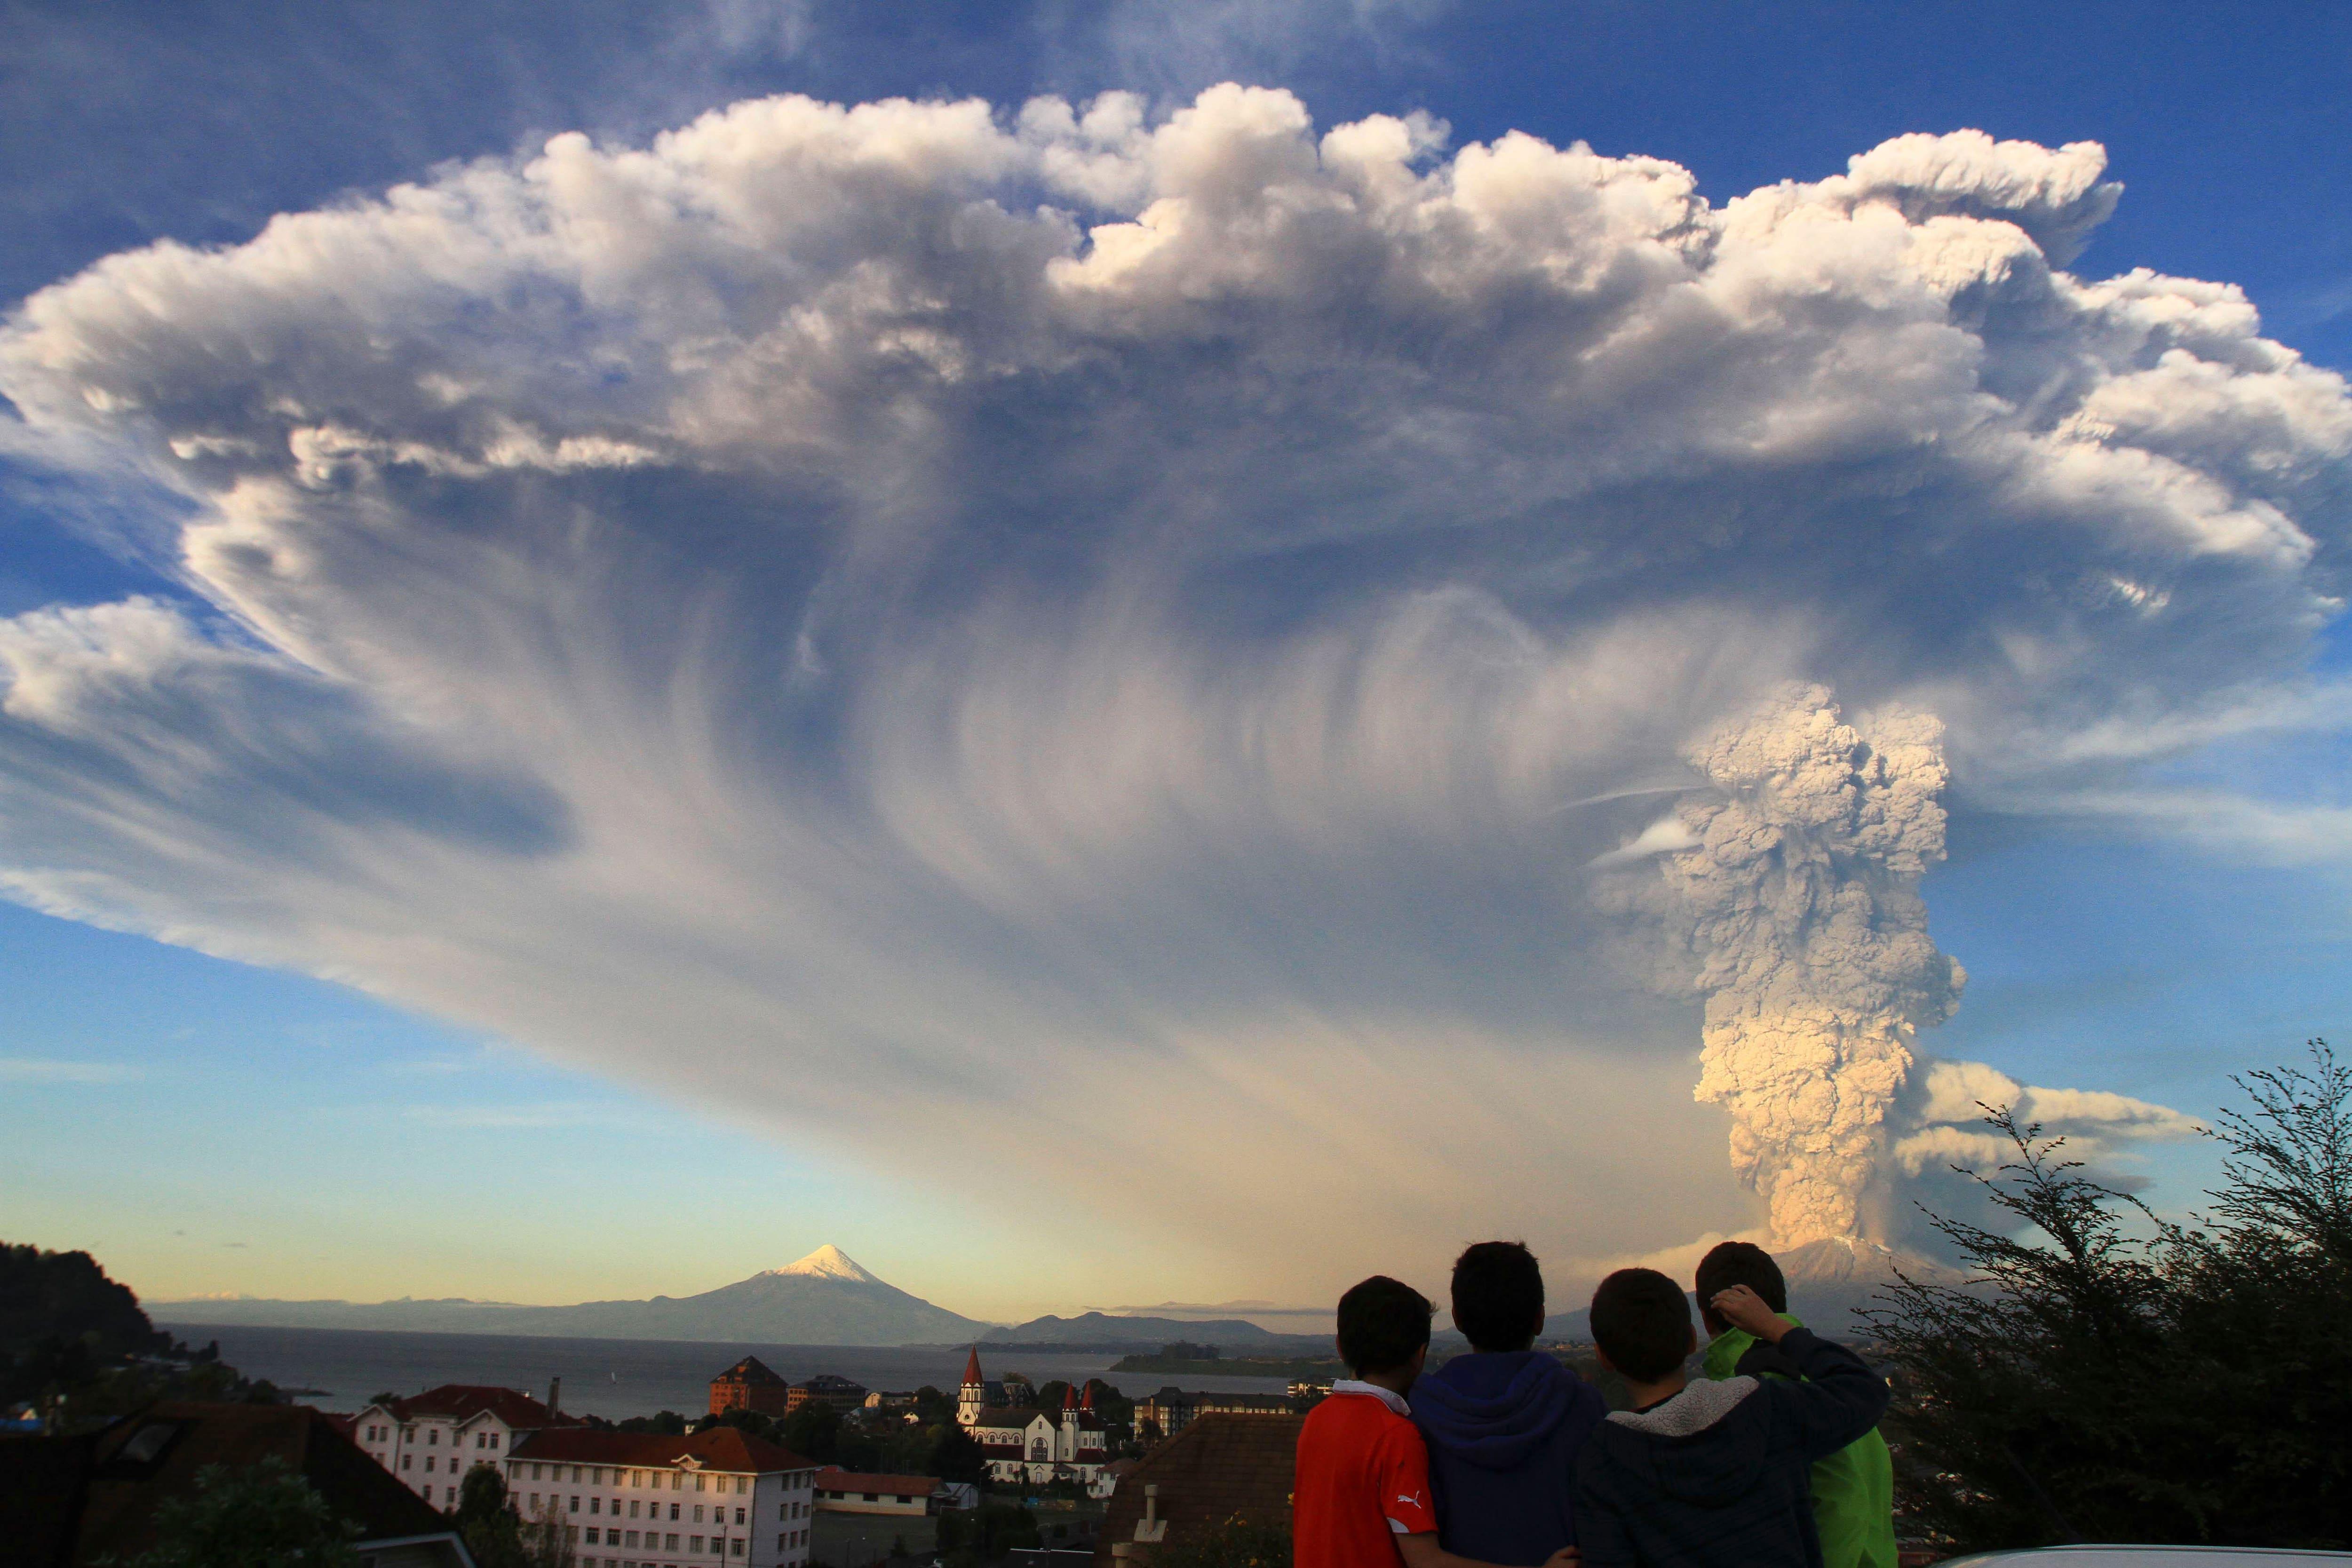 Children watch the Calbuco volcano erupt, from Puerto Varas, Chile.